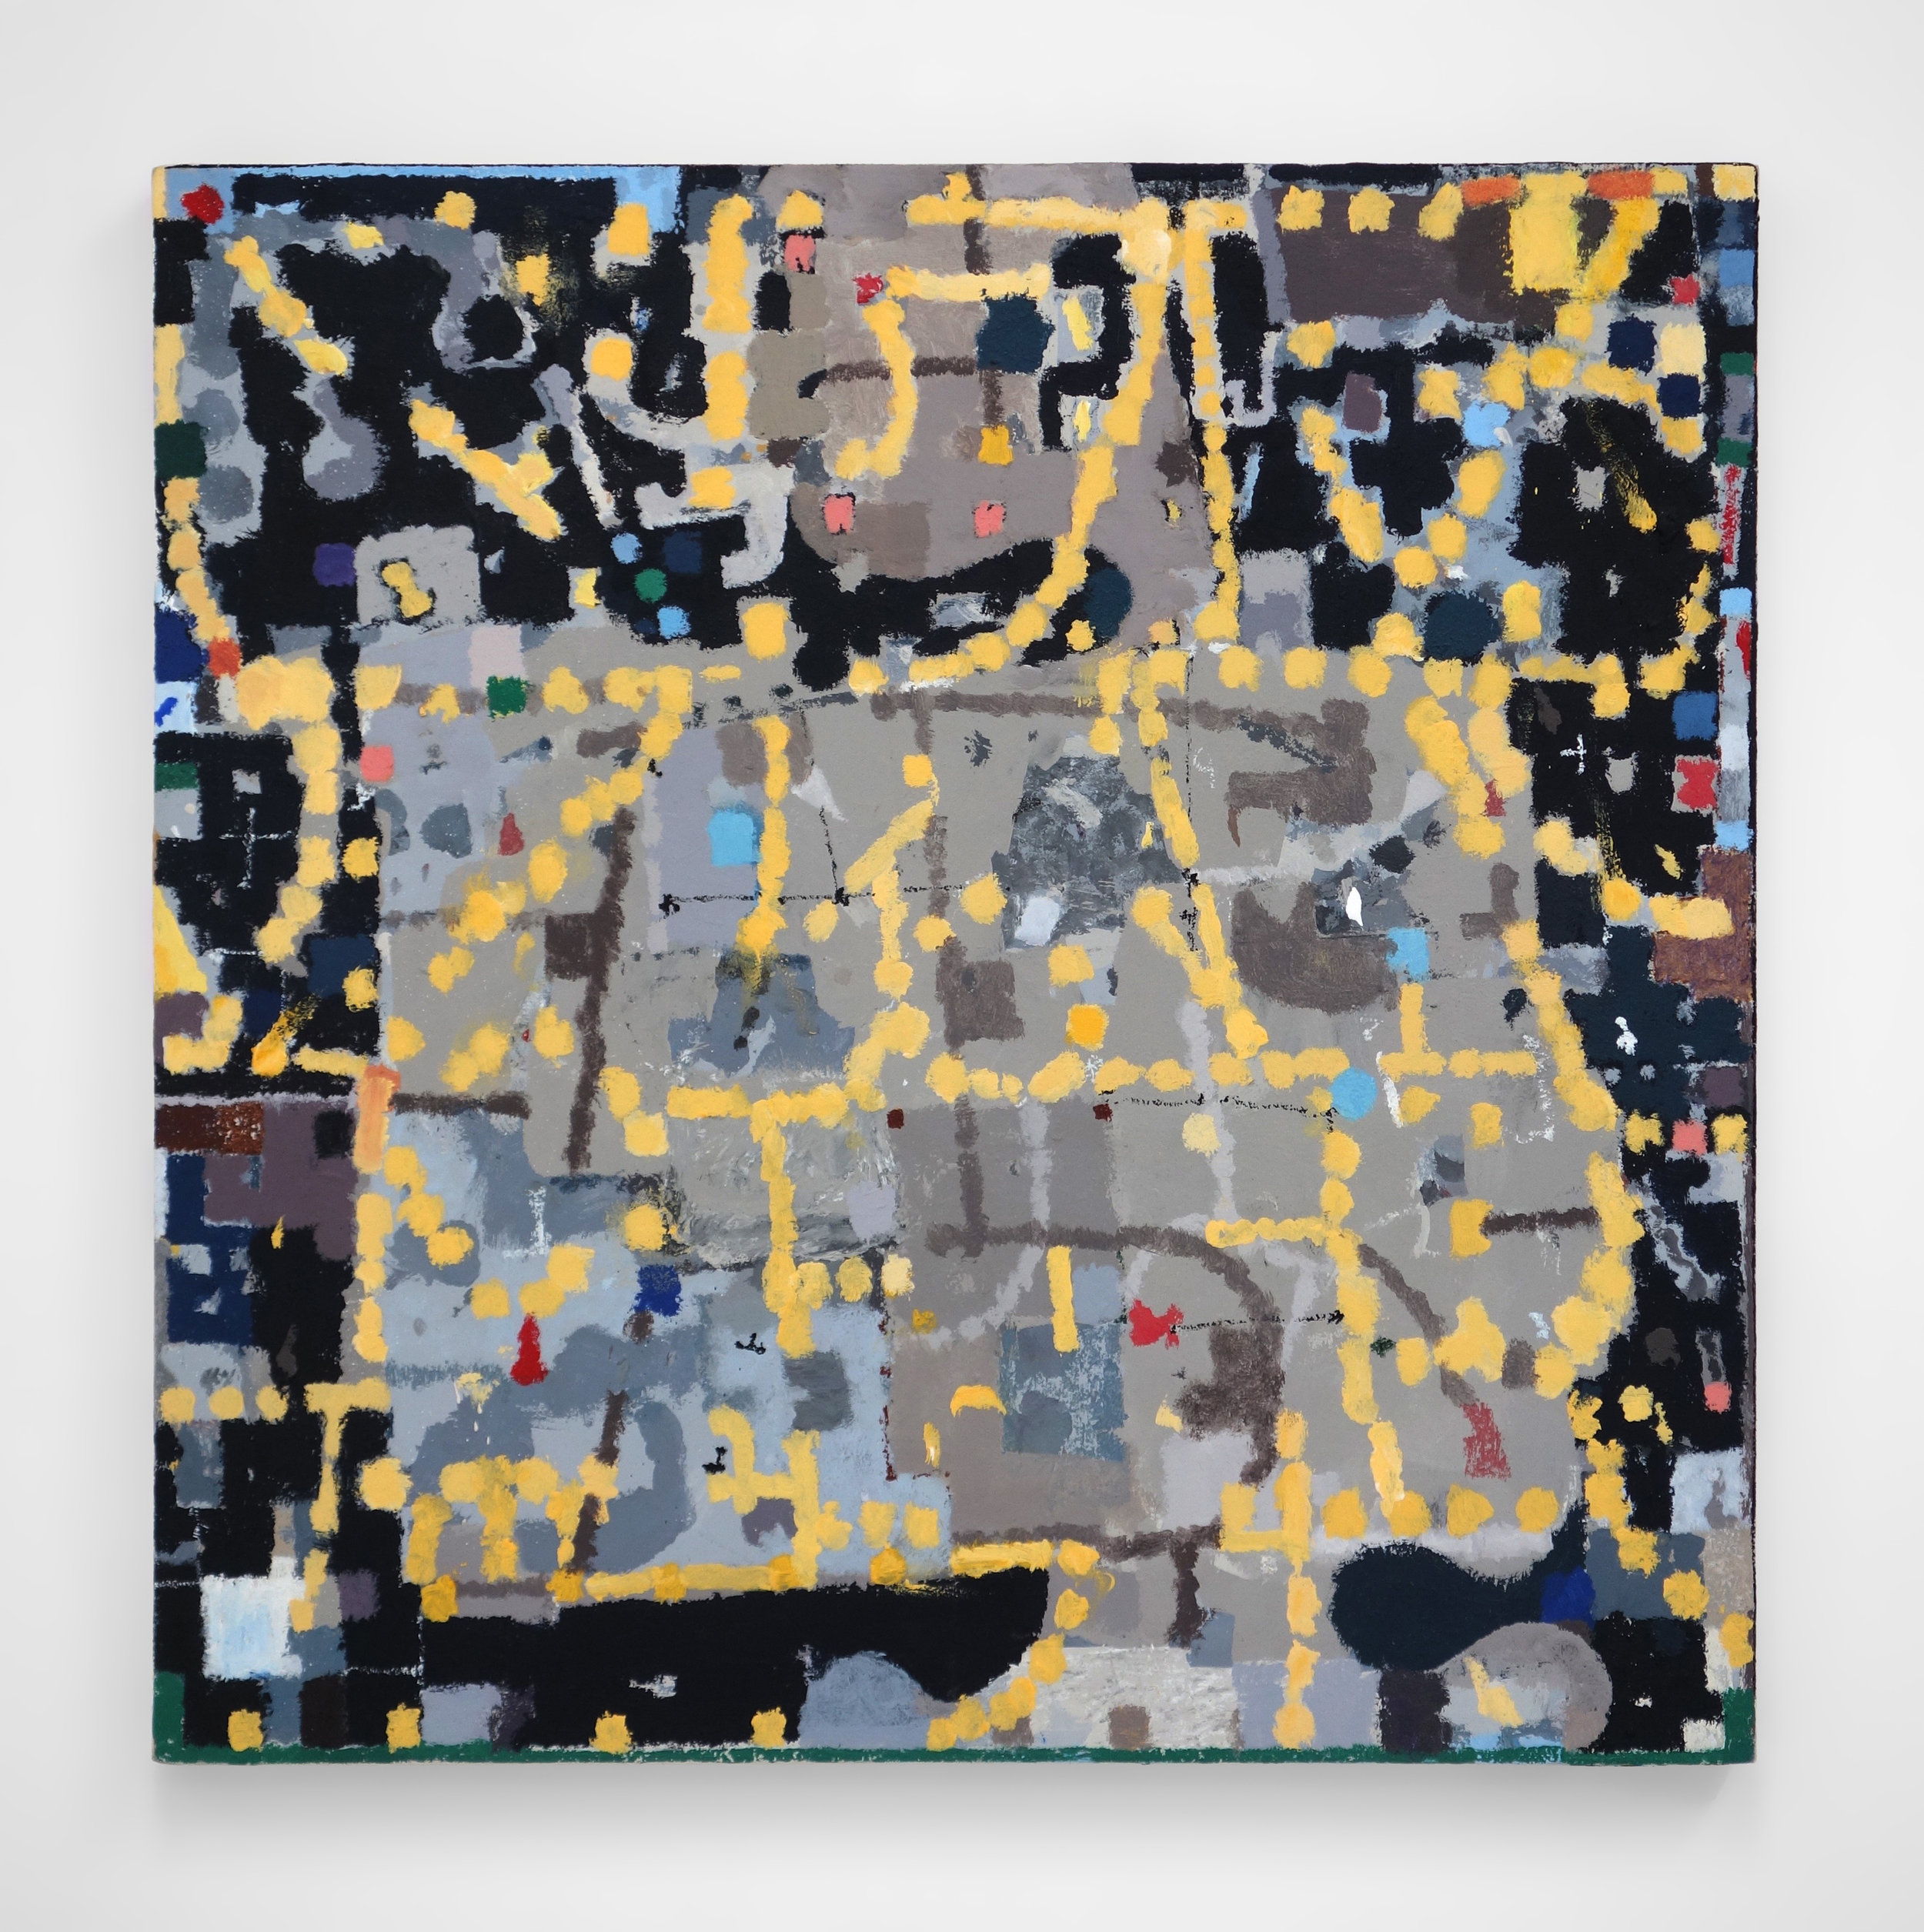 Jack Coyle sq painting 2.jpg